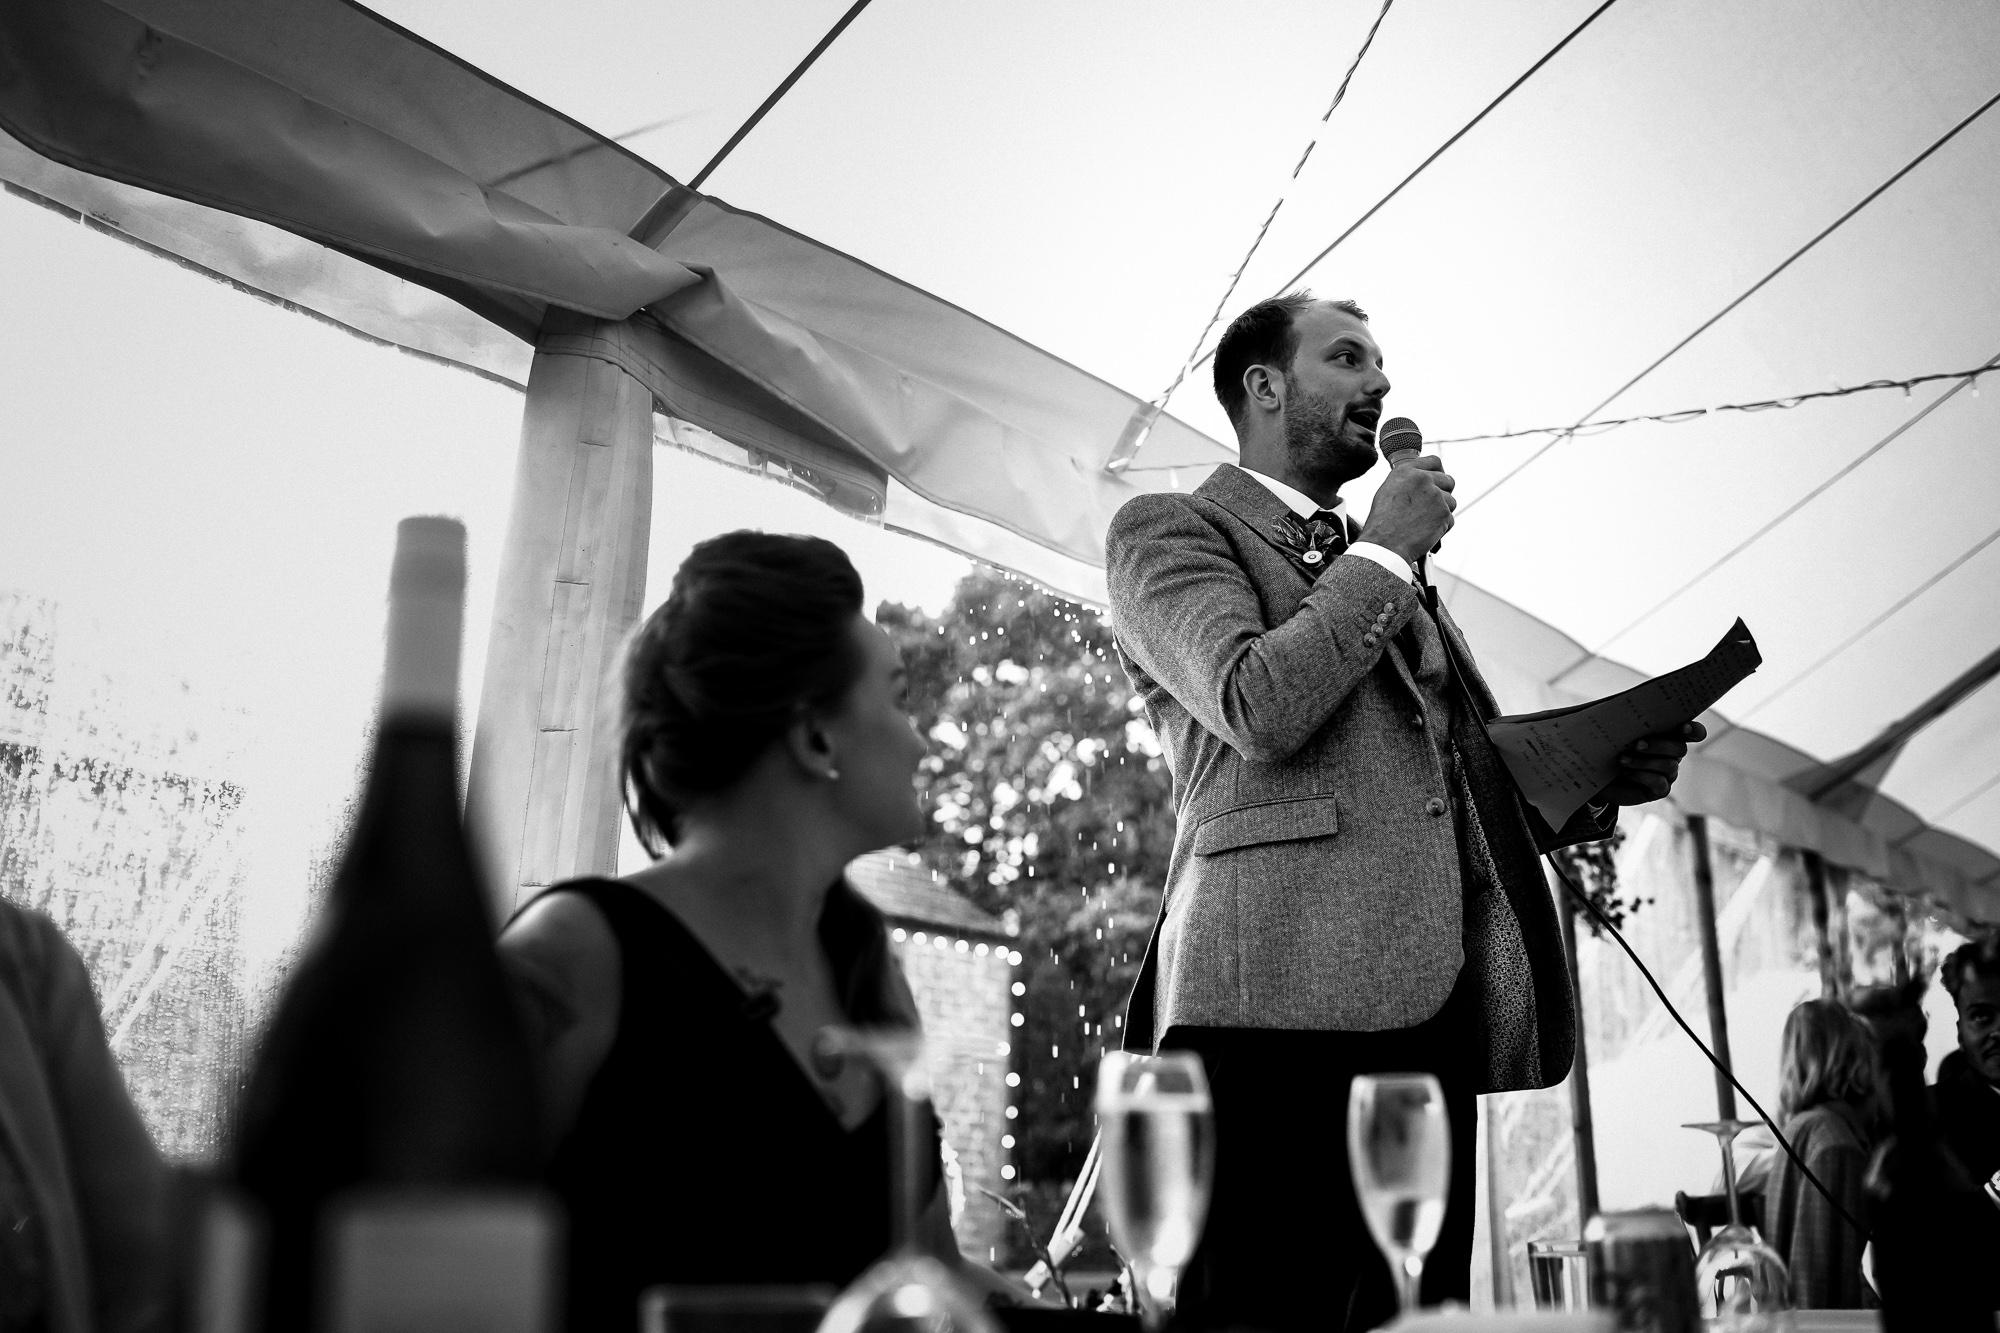 High Barn Wedding photographer lake distect penrith documentry wedding photography (43 of 57).jpg